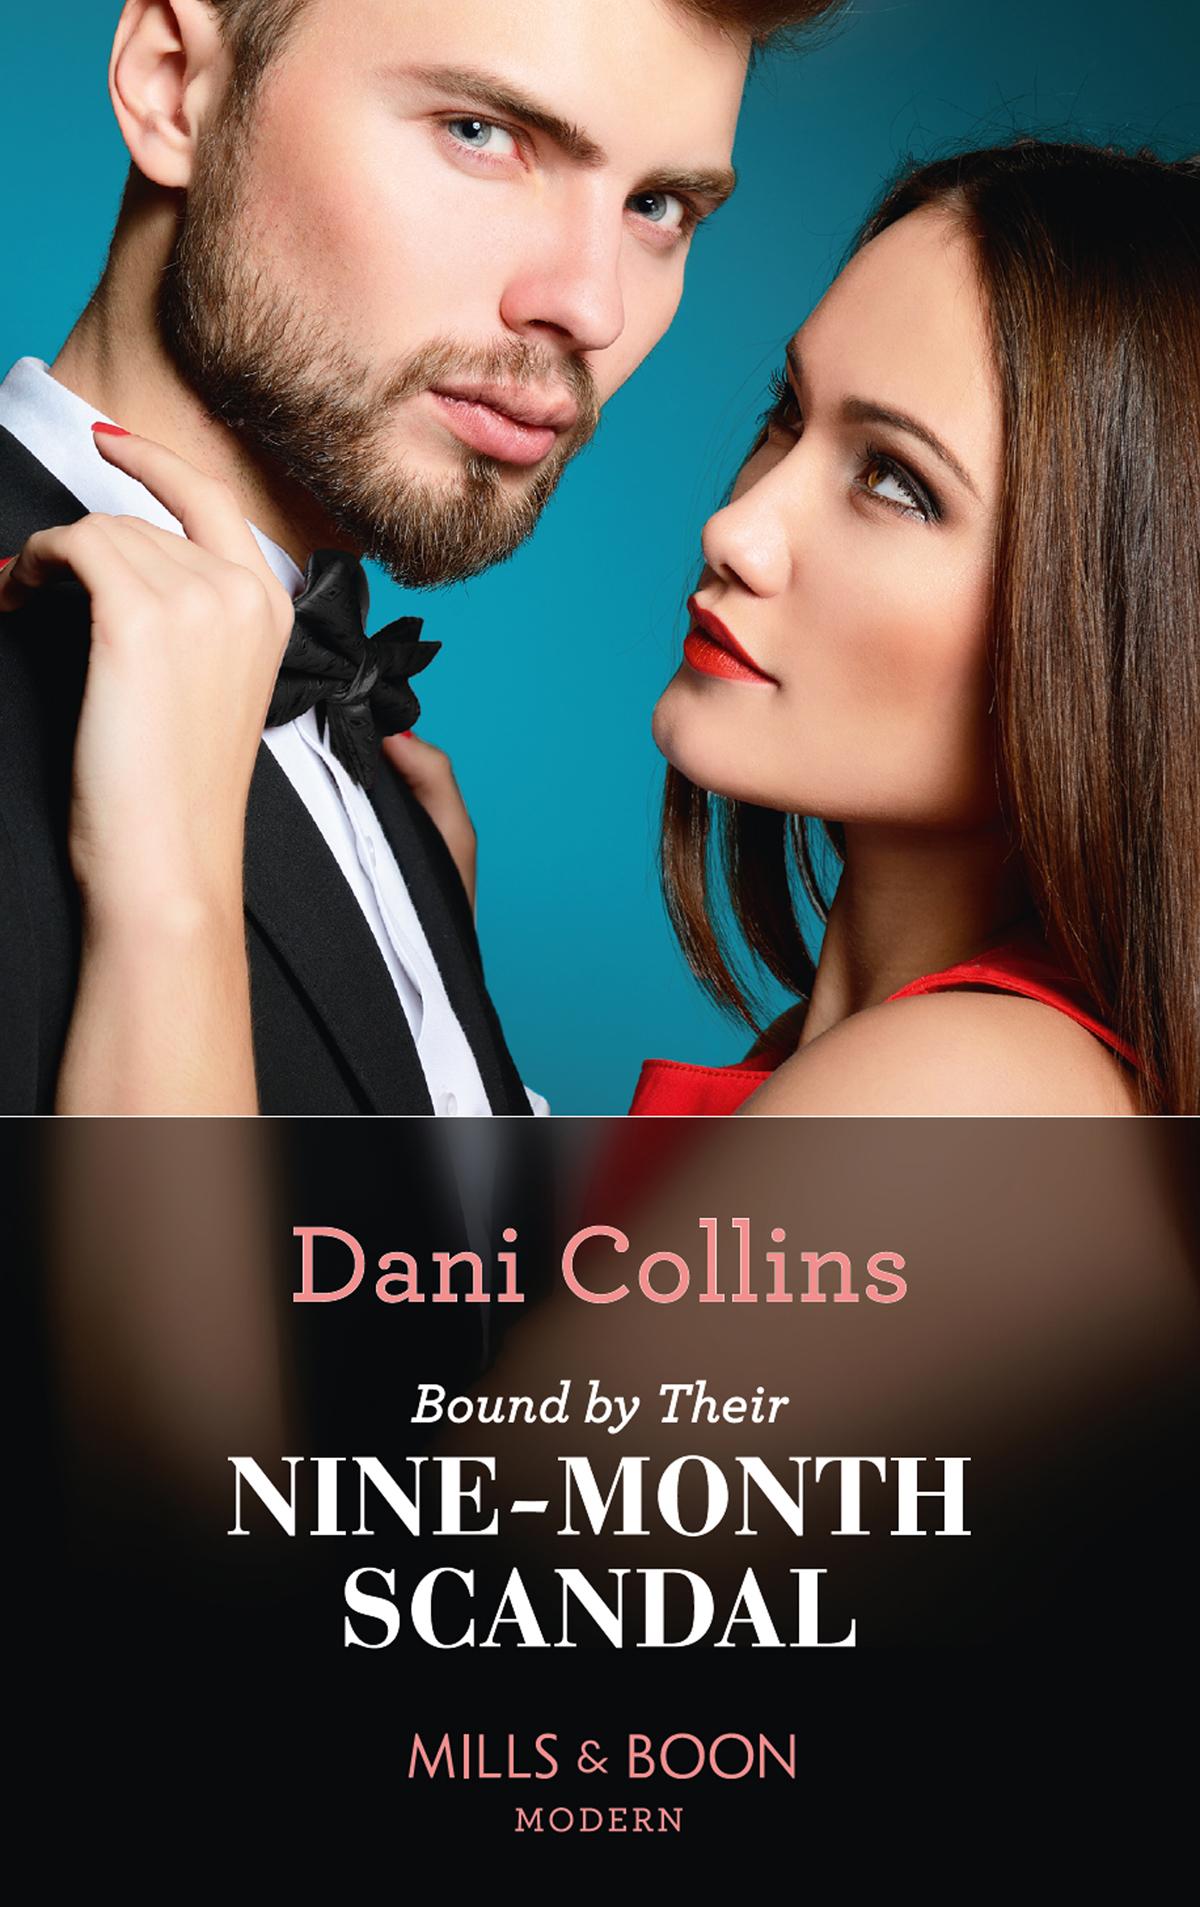 цена на Dani Collins Bound By Their Nine-Month Scandal